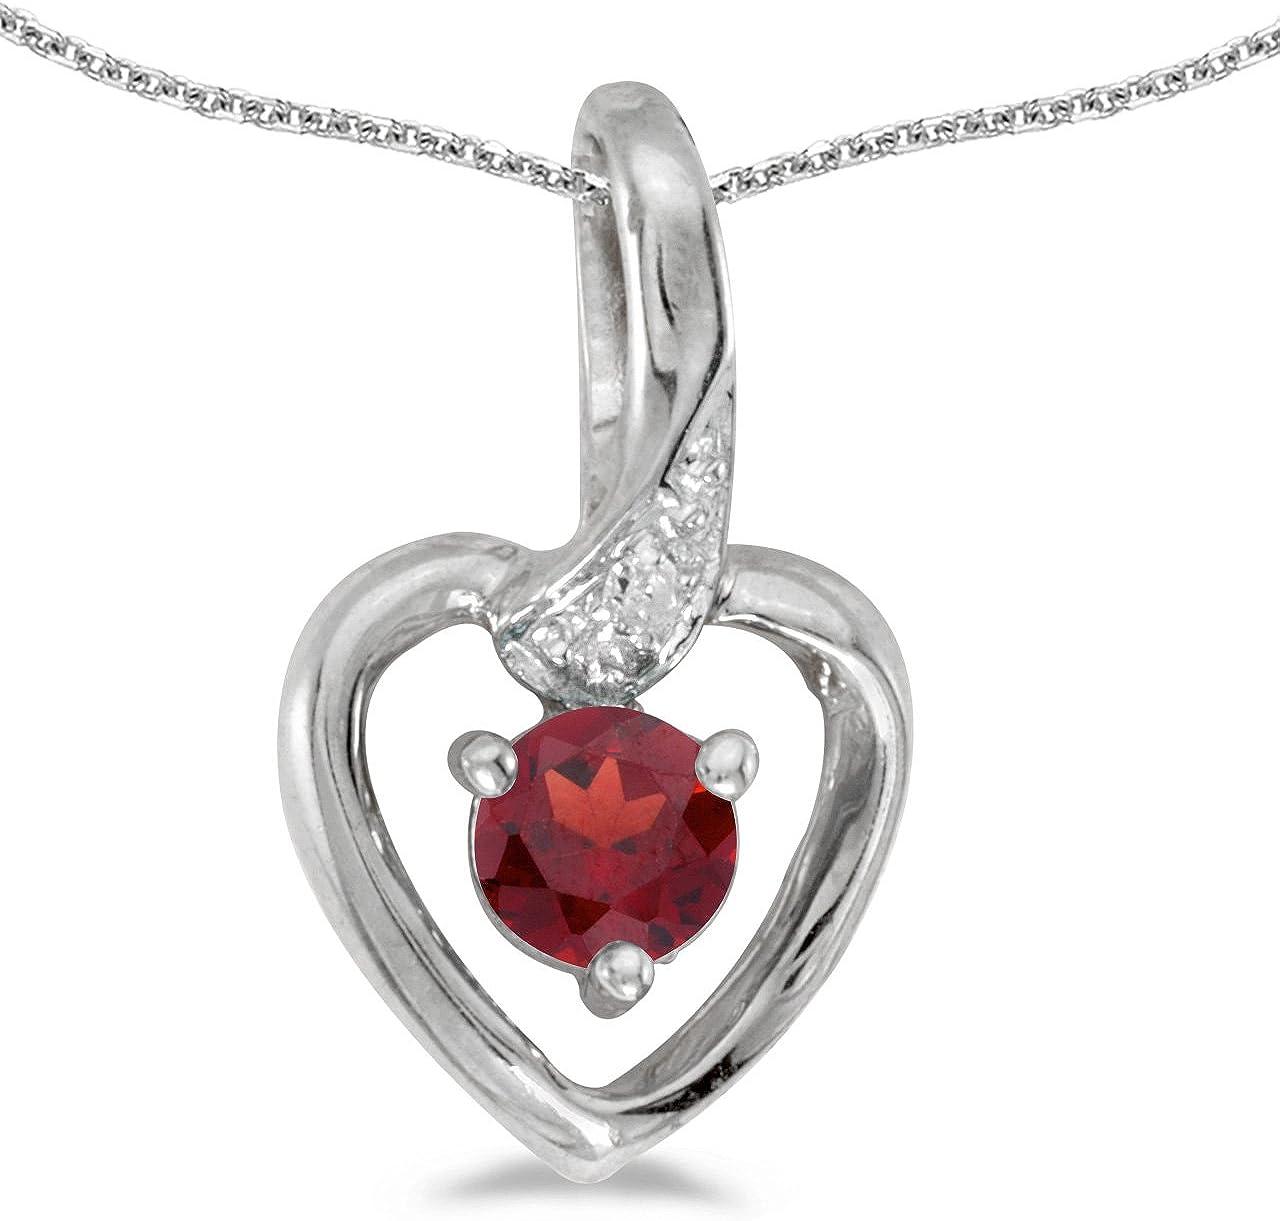 0.28 Cttw. Jewels By Lux 10k White Gold Genuine Birthstone Round Gemstone And Diamond Heart Pendant